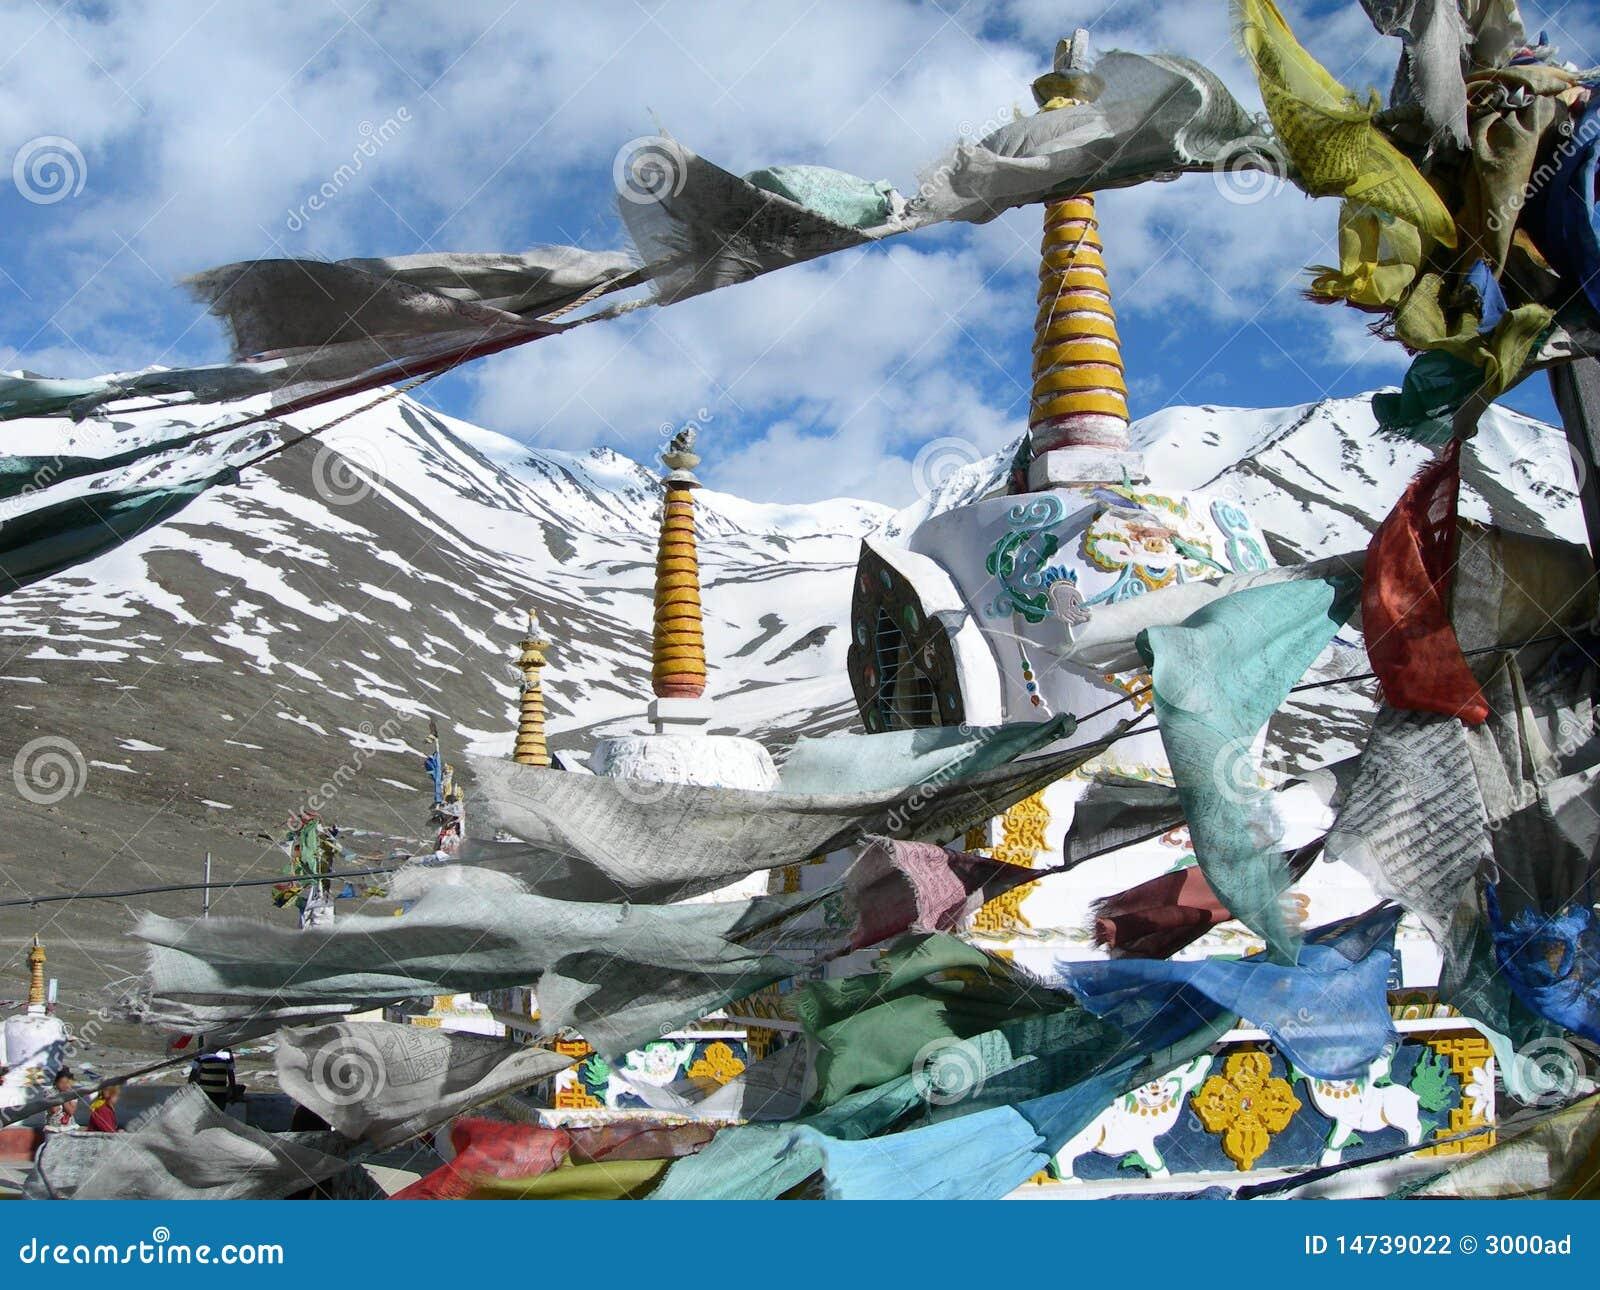 Colorful prayer flags in himalaya region